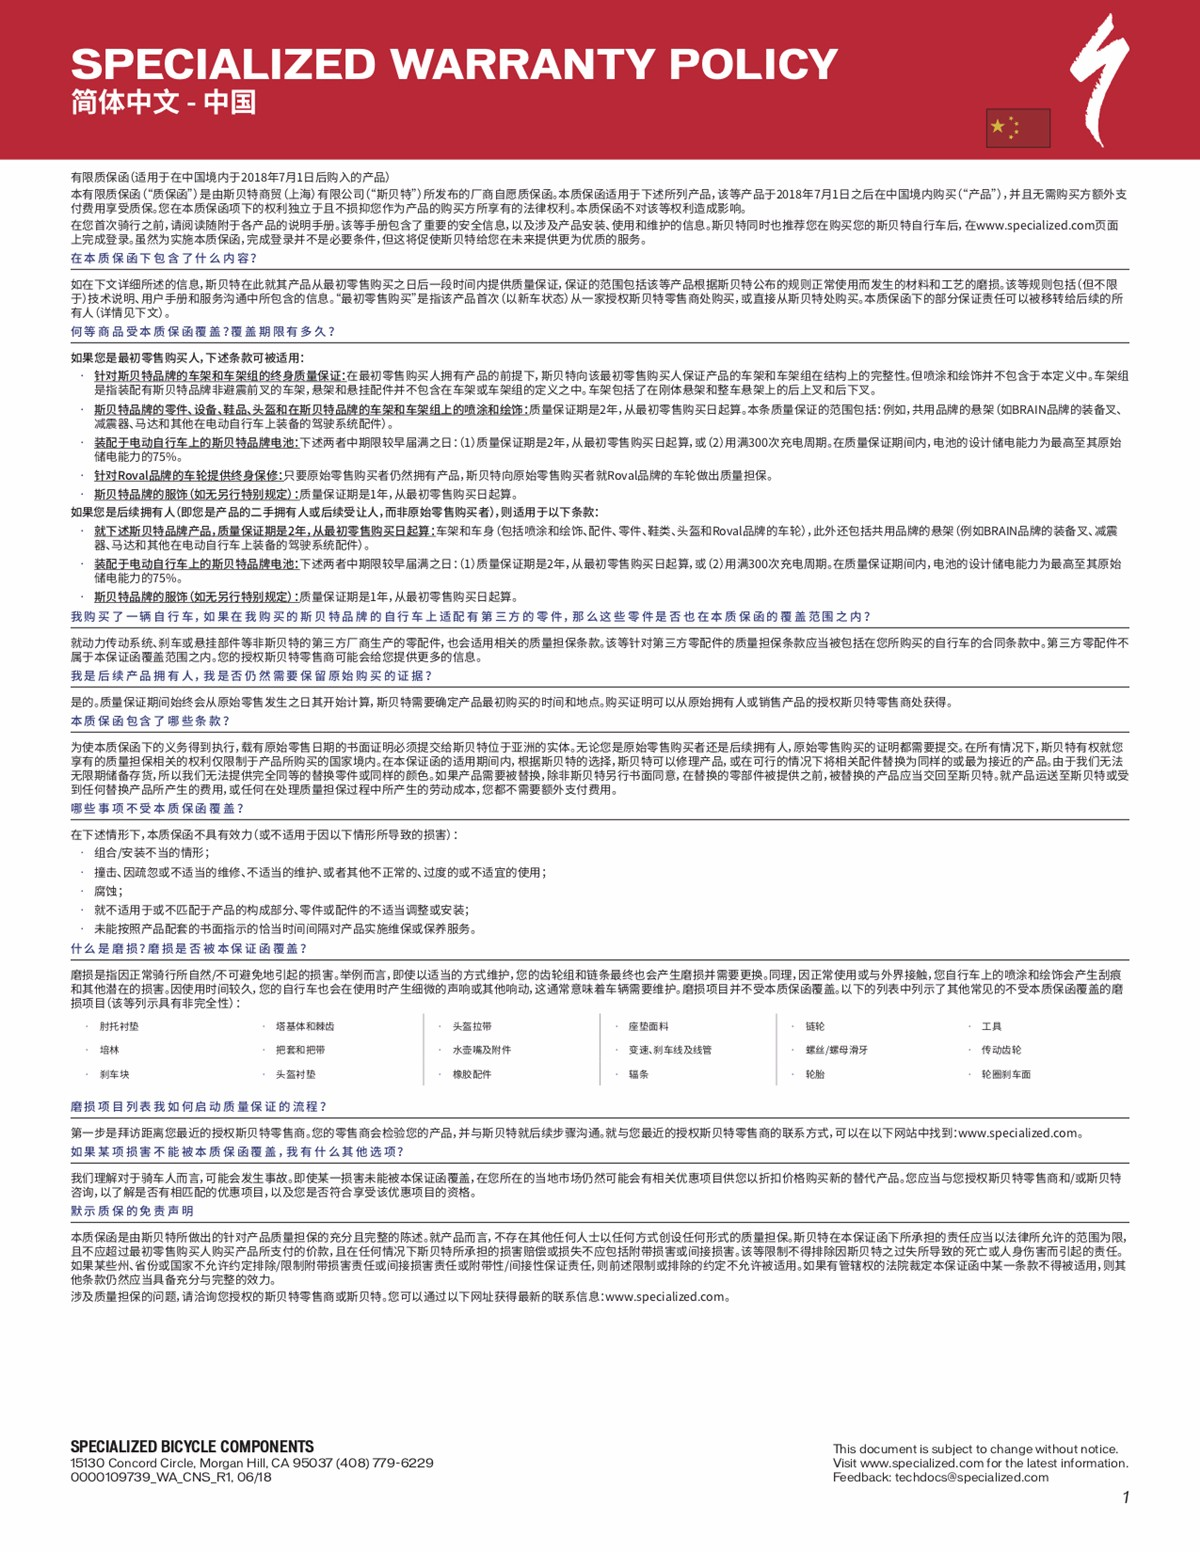 Warranty---China[3] (1)_副本.jpg